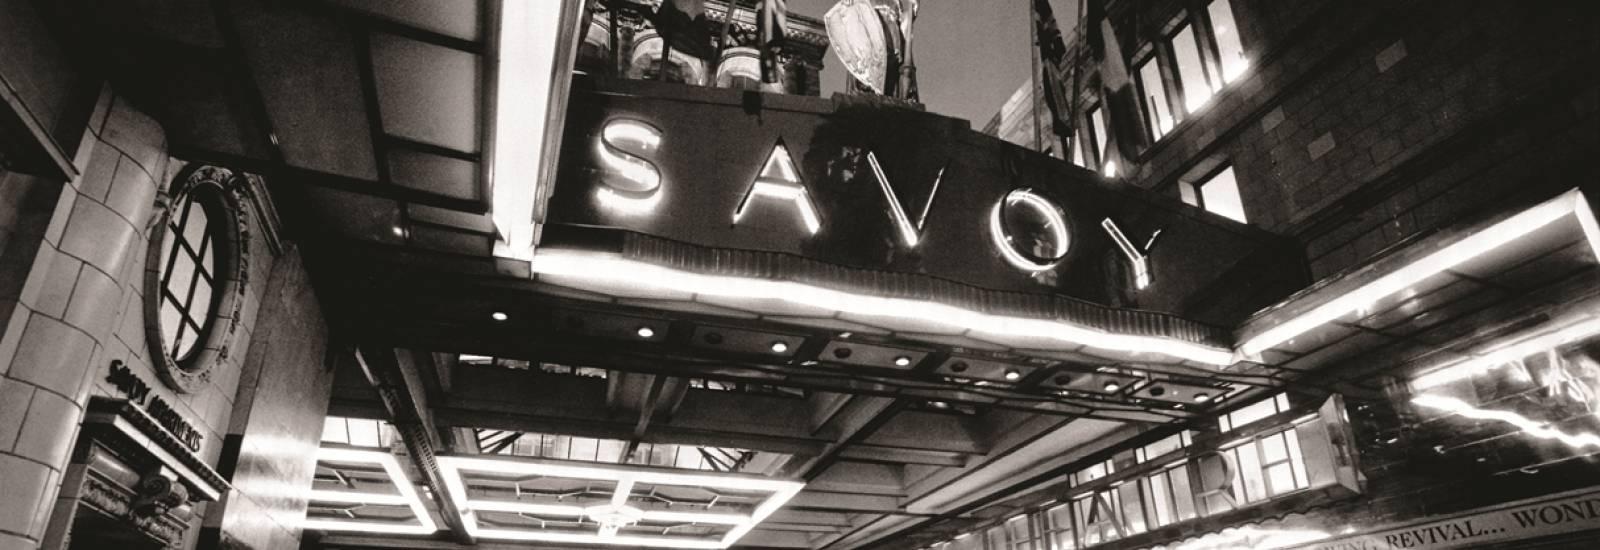 savoy theatre meal deals